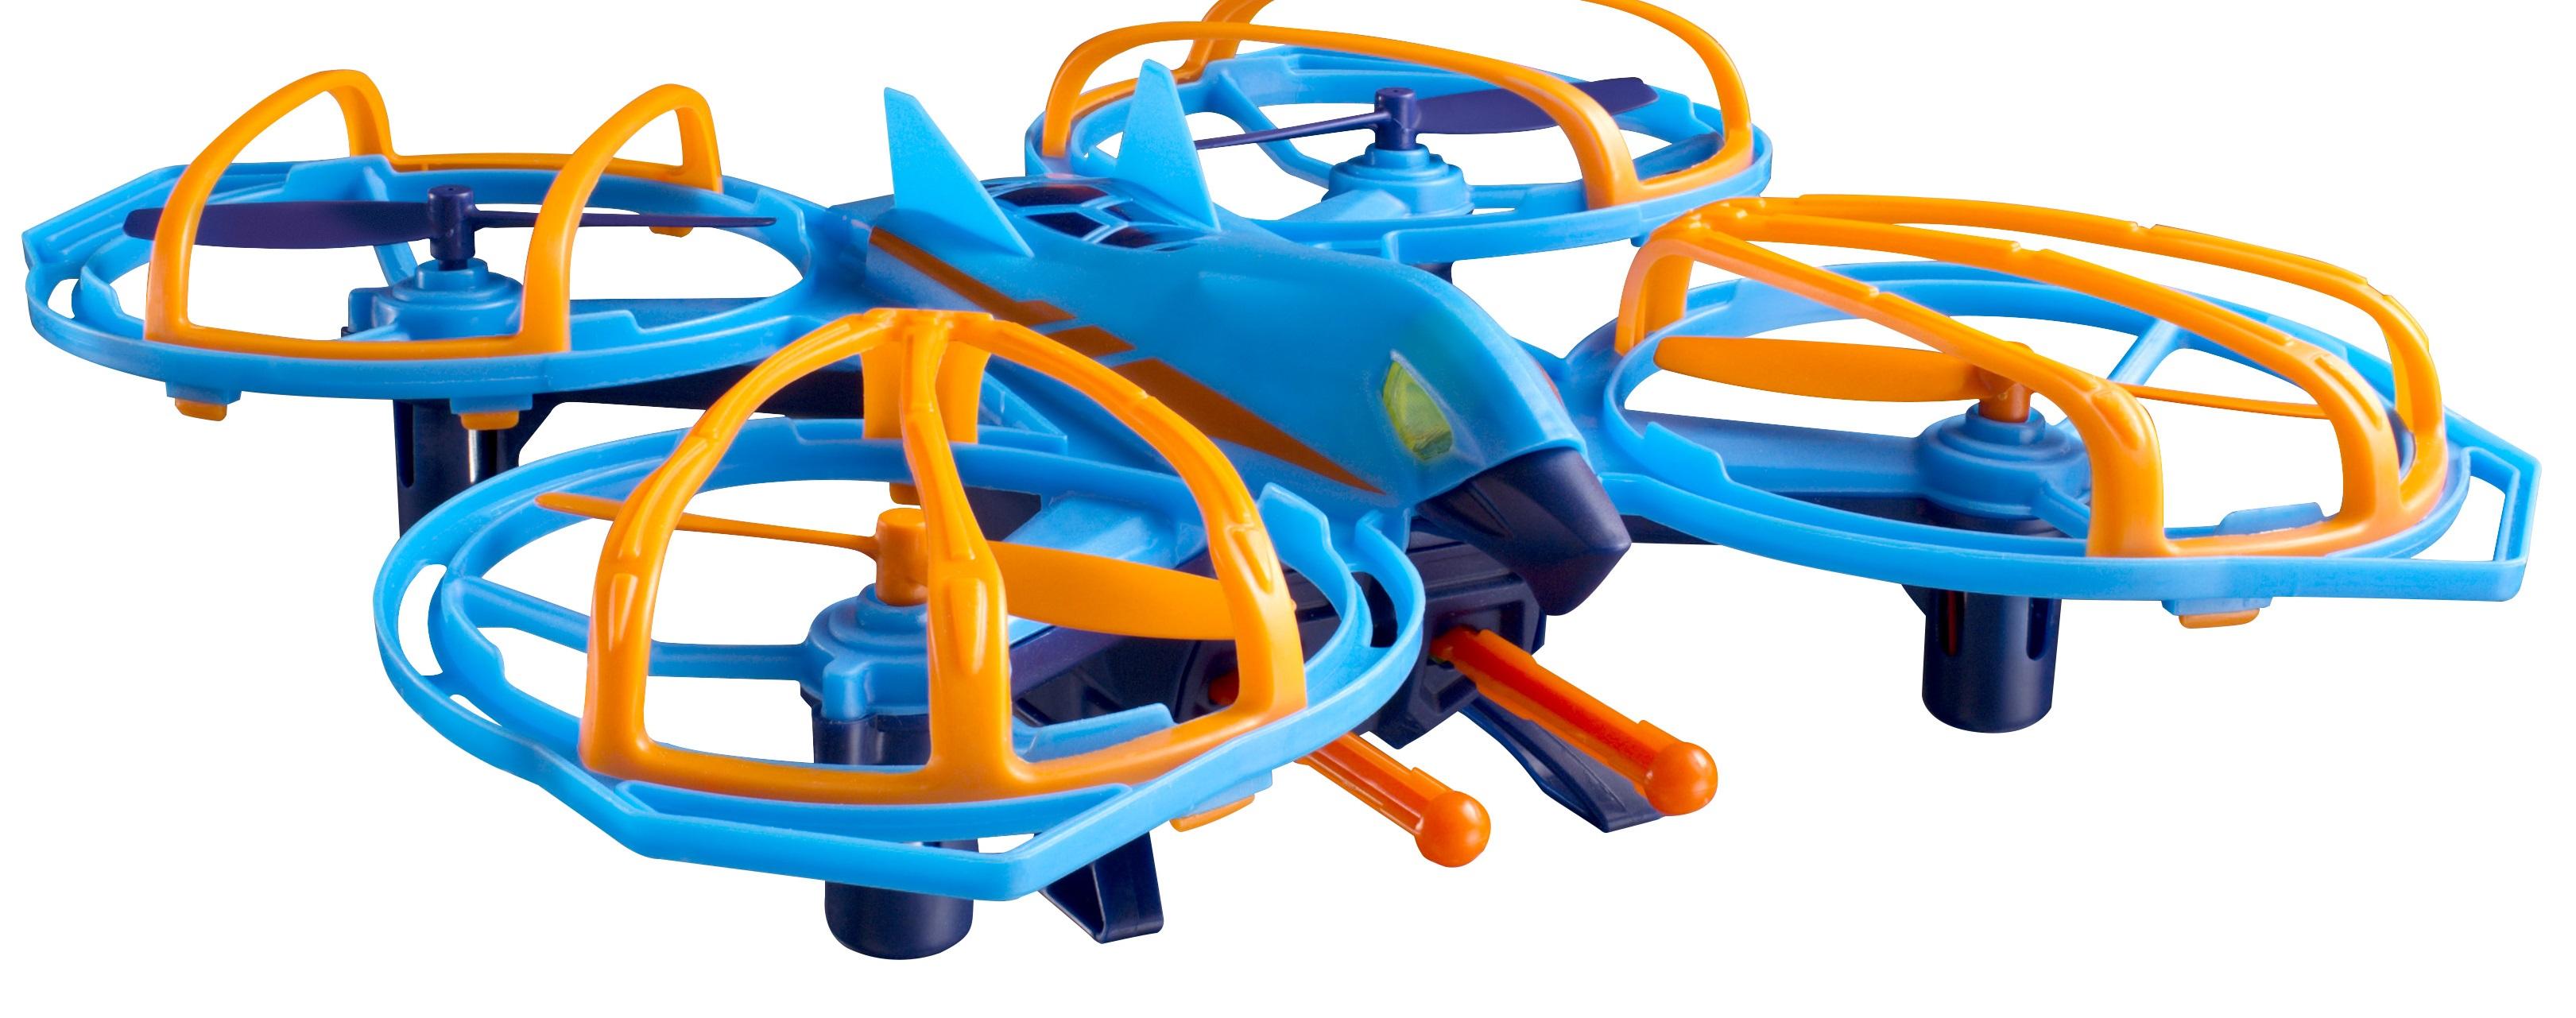 Купить Квадрокоптер Auldey Drone Force Vulture Strike (YW858170)